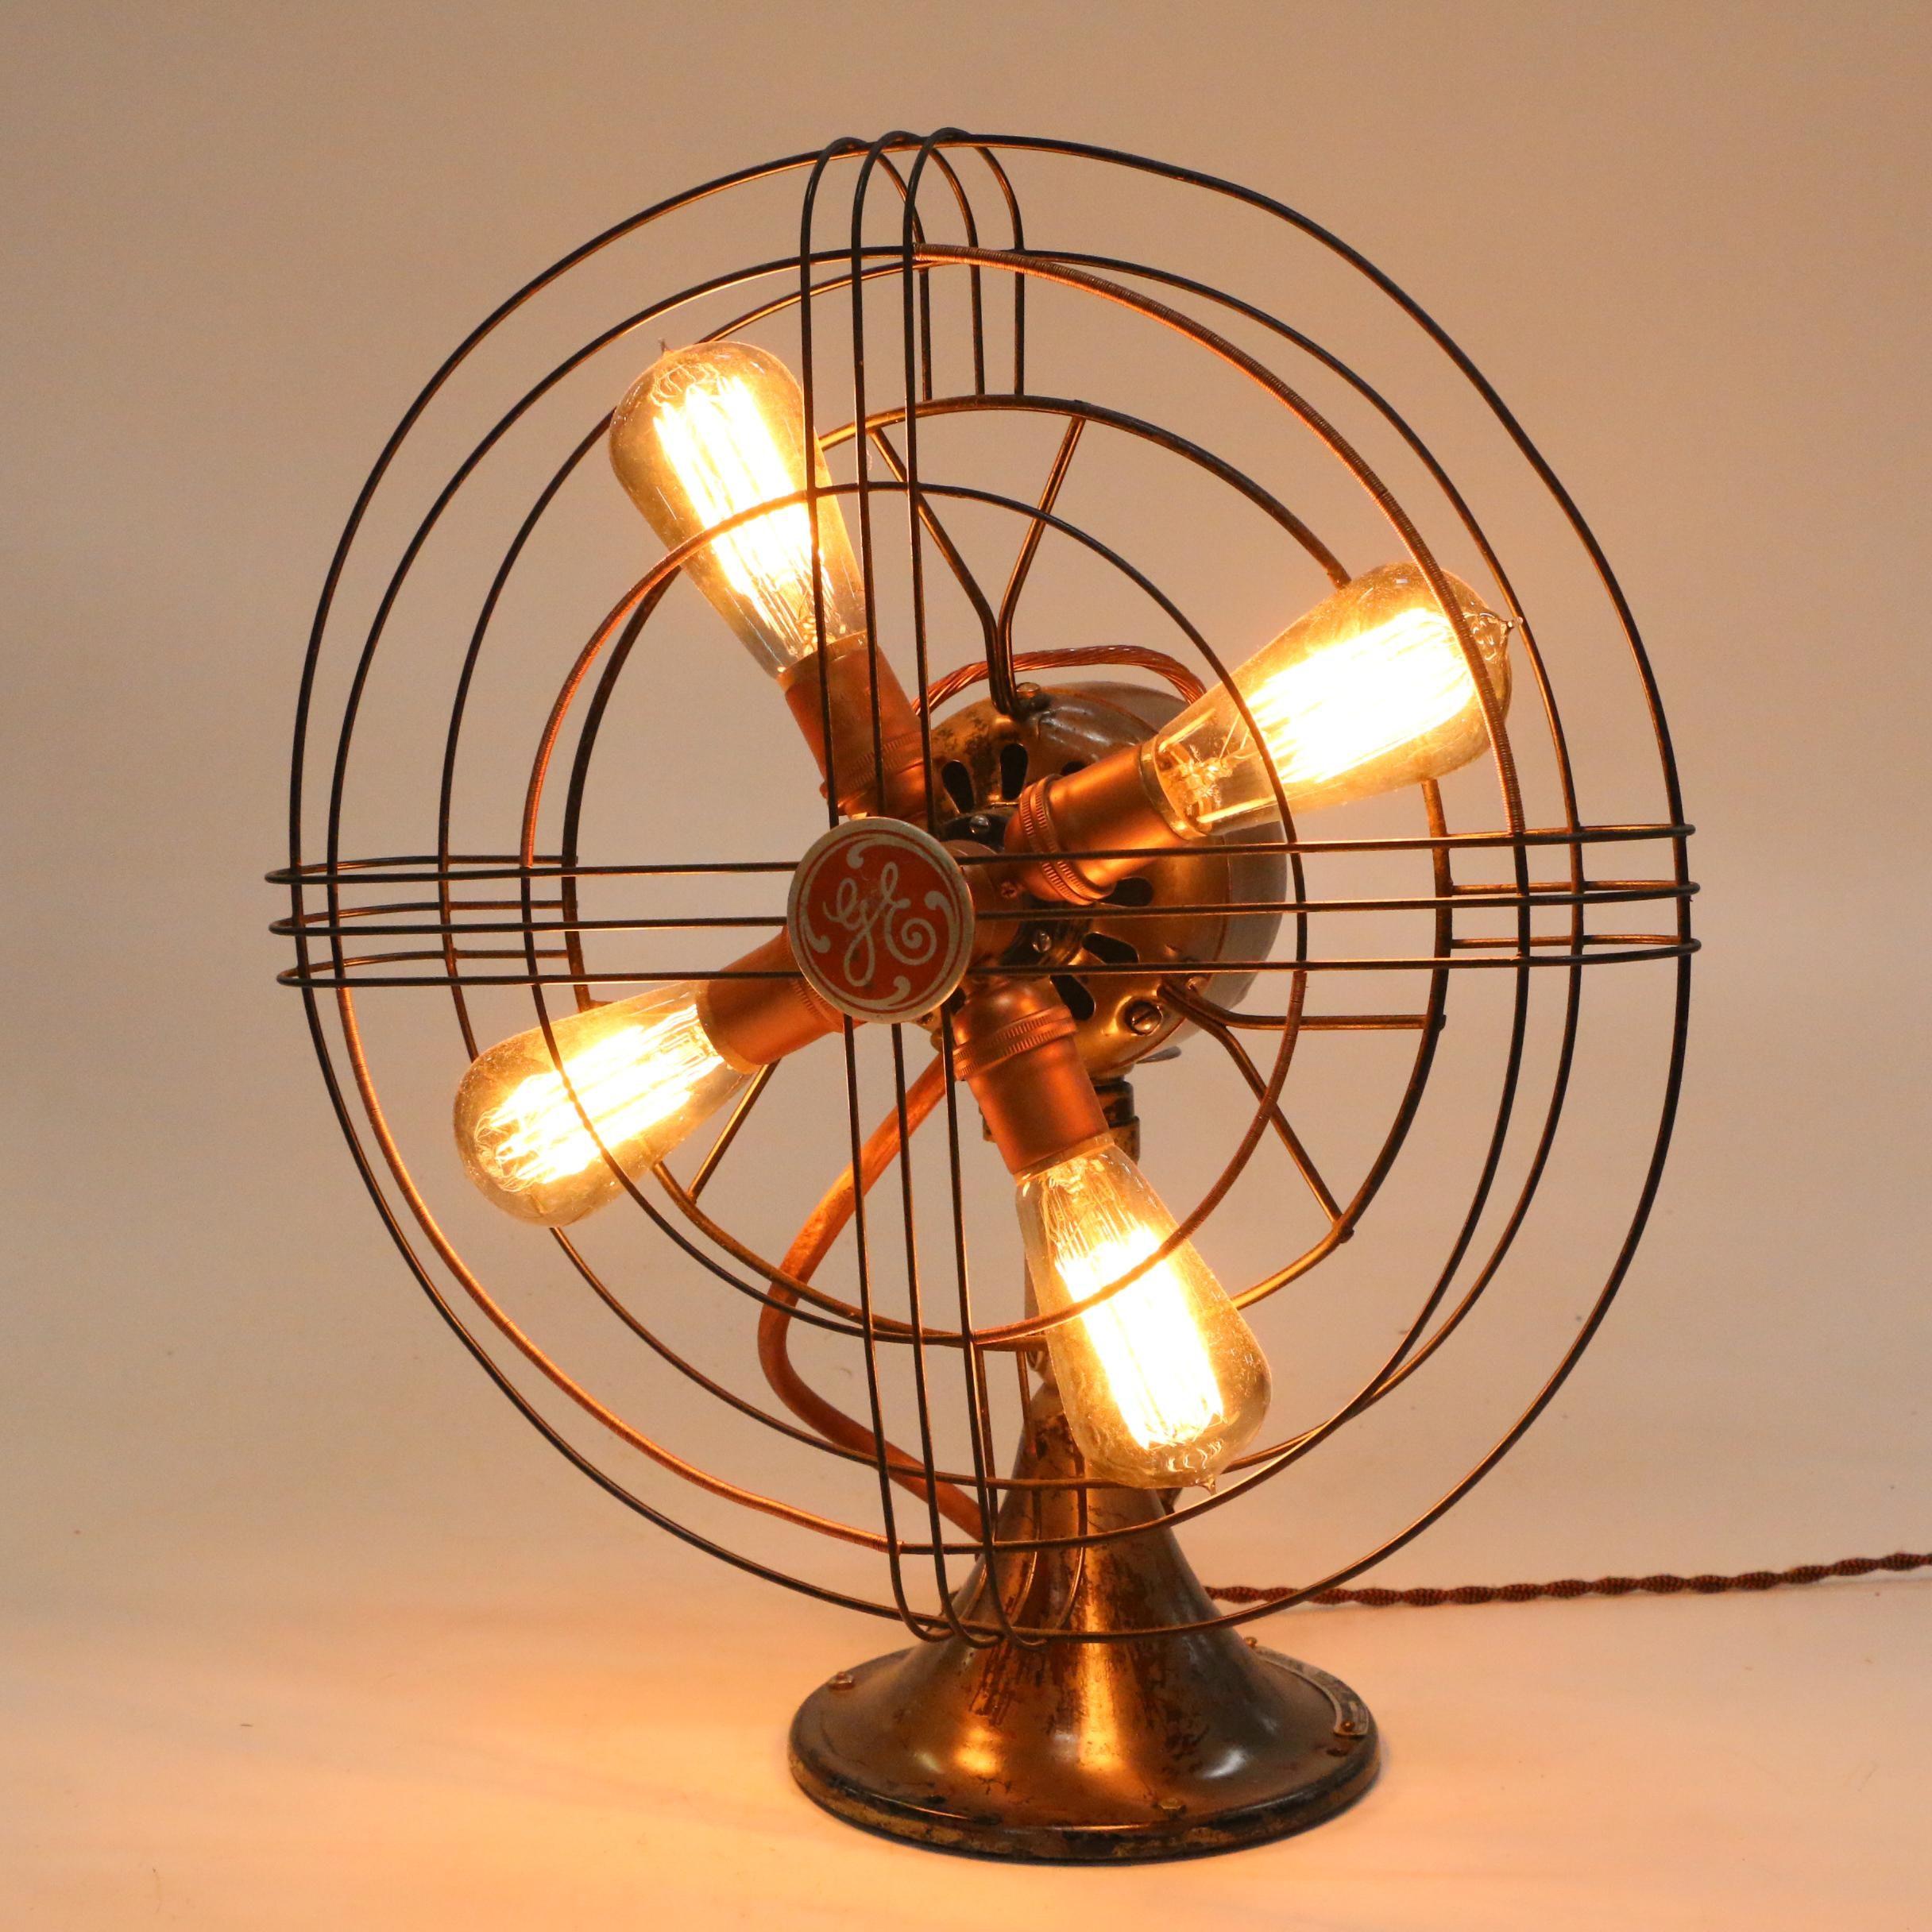 Industrial General Electric Fan Table Lamp